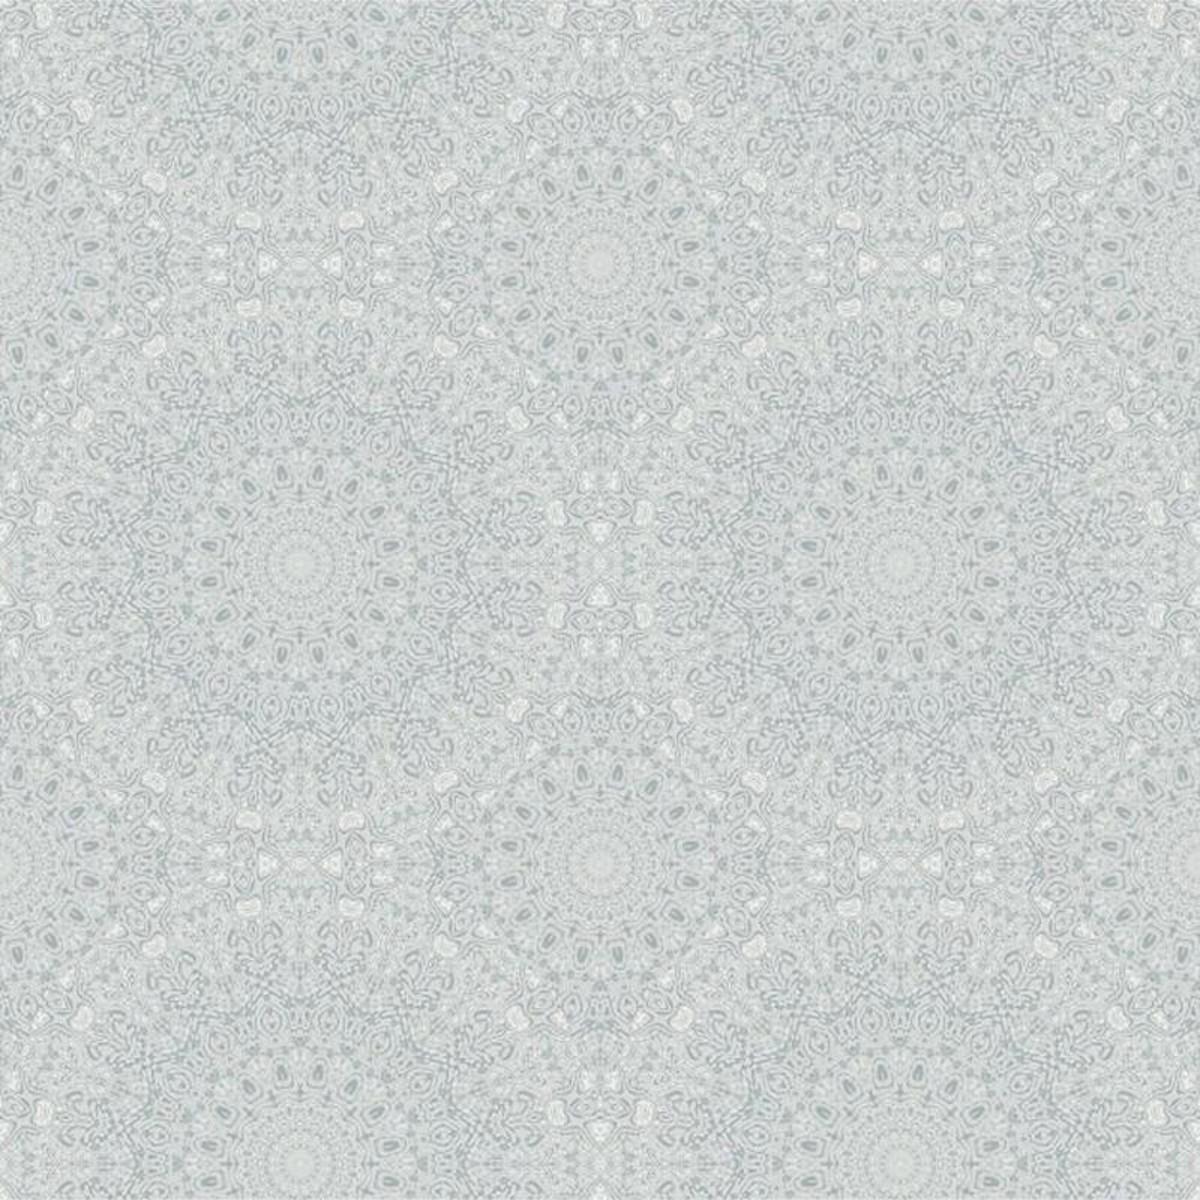 Обои флизелиновые Collection For Walls Northern Feelings синие 0.53 м 200306